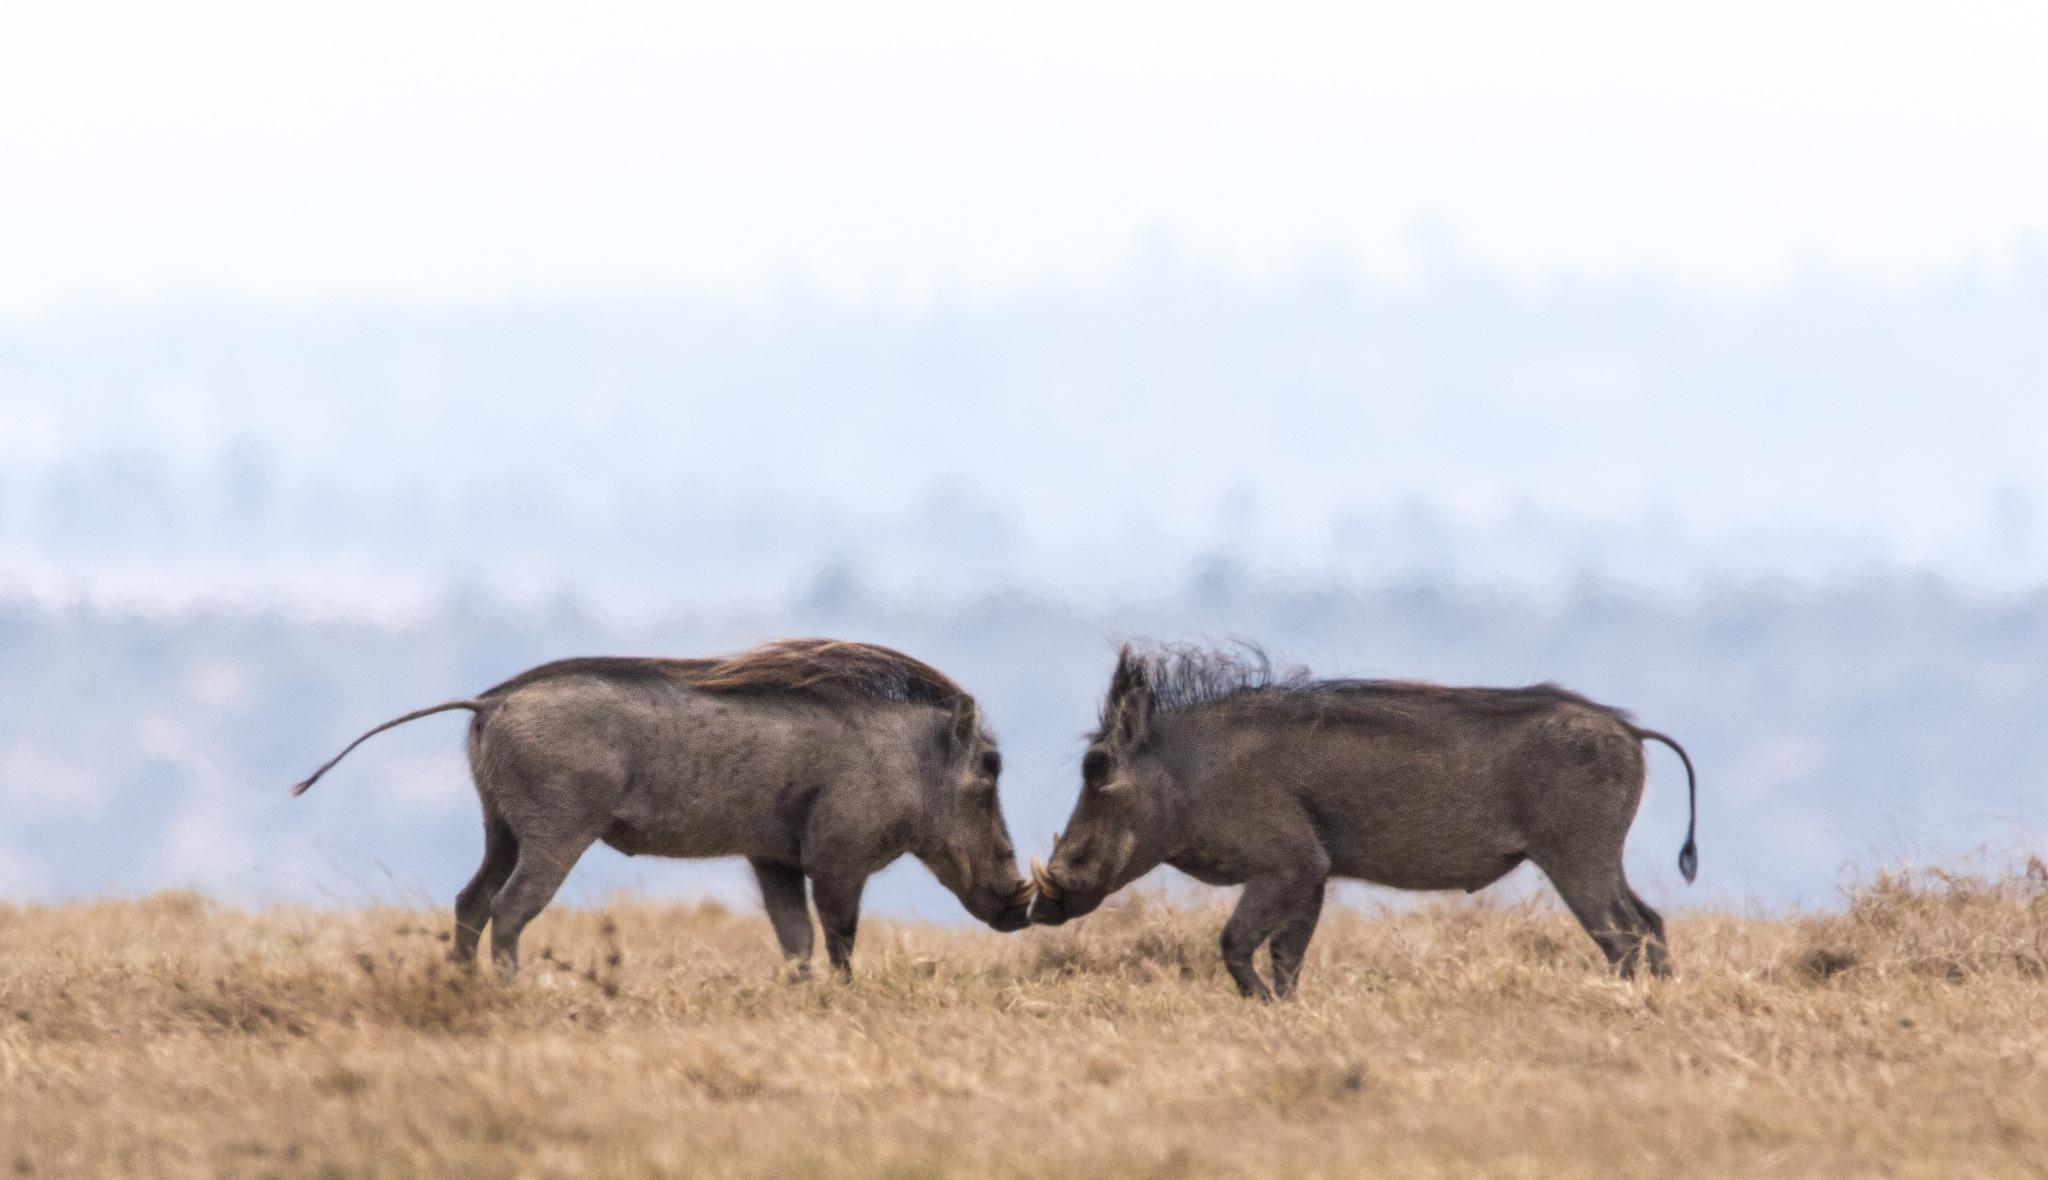 Fighting warthogs by Linda Myrberg